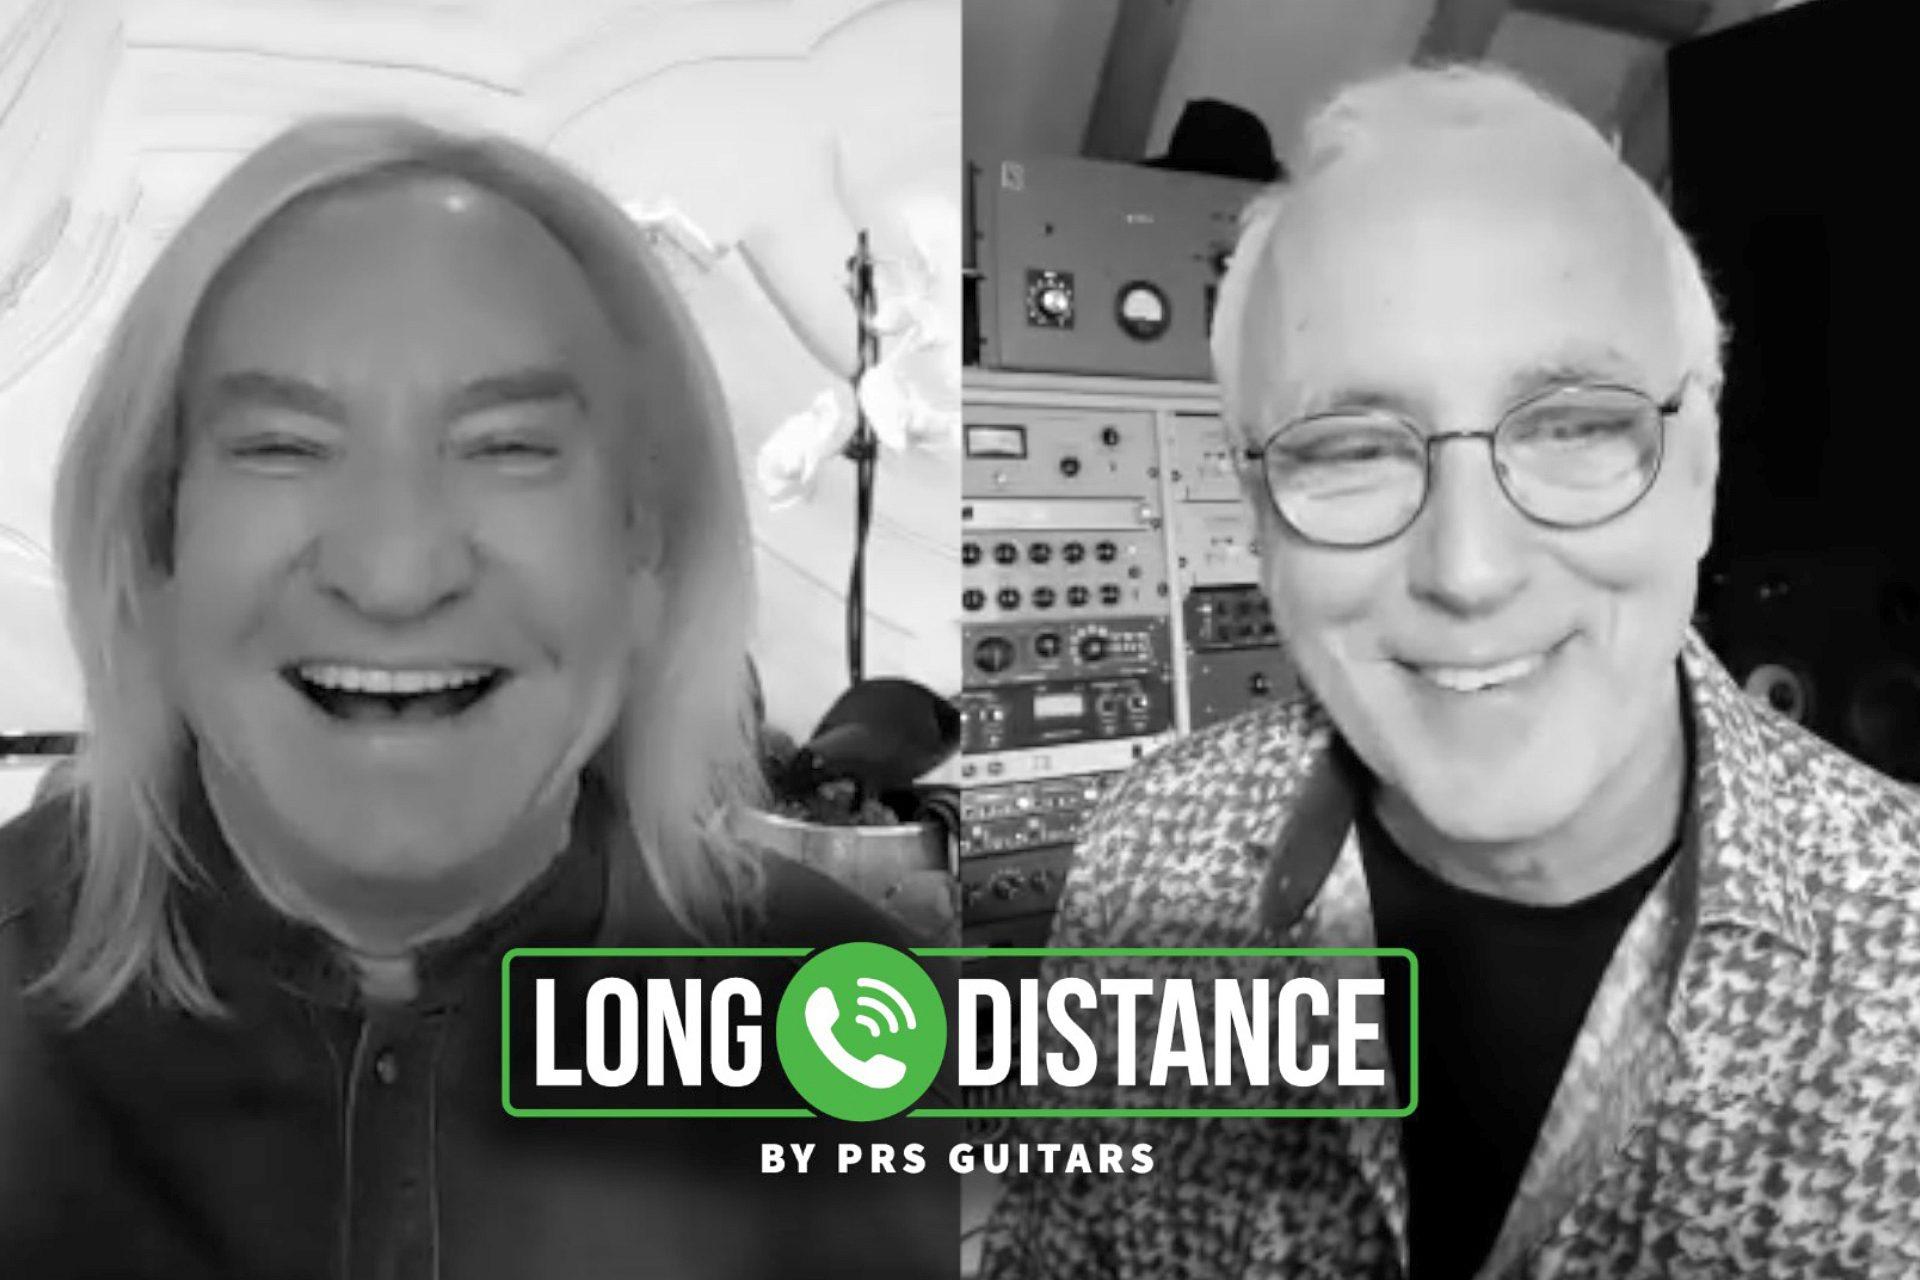 New Episode of Long Distance! Paul Calls Joe Walsh